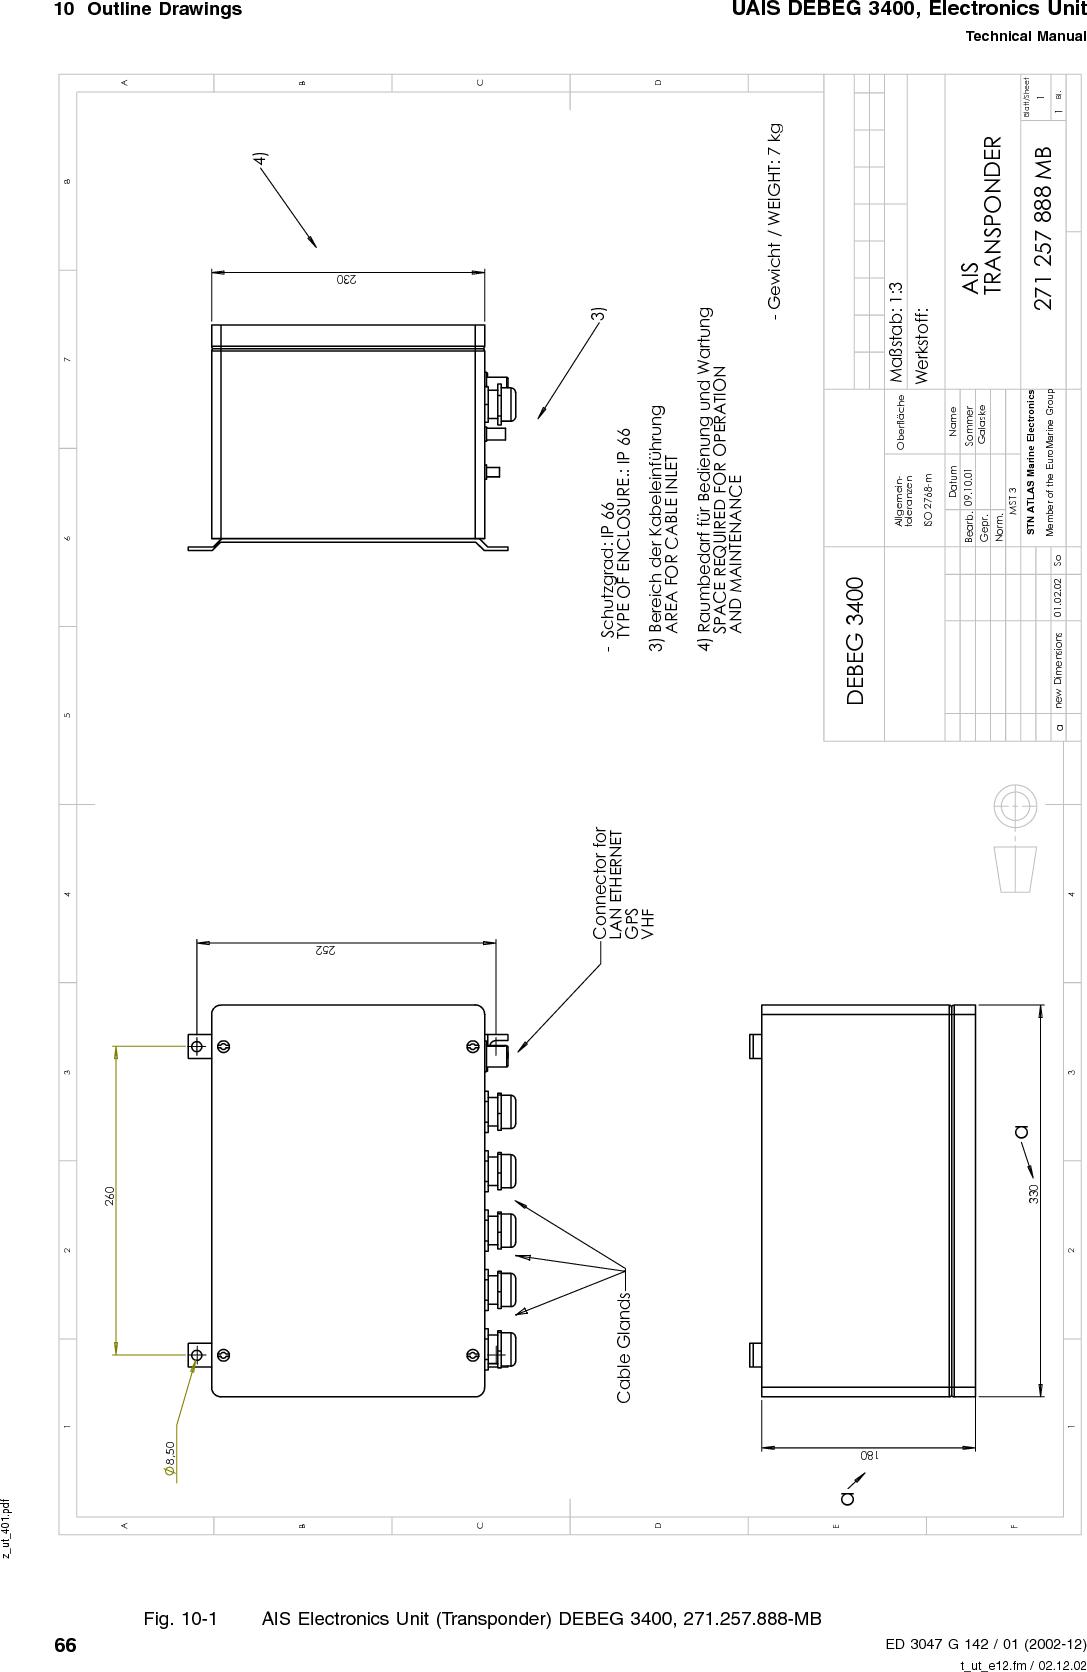 Leica MX Marine MX531 MX 531 AIS Transponder User Manual t